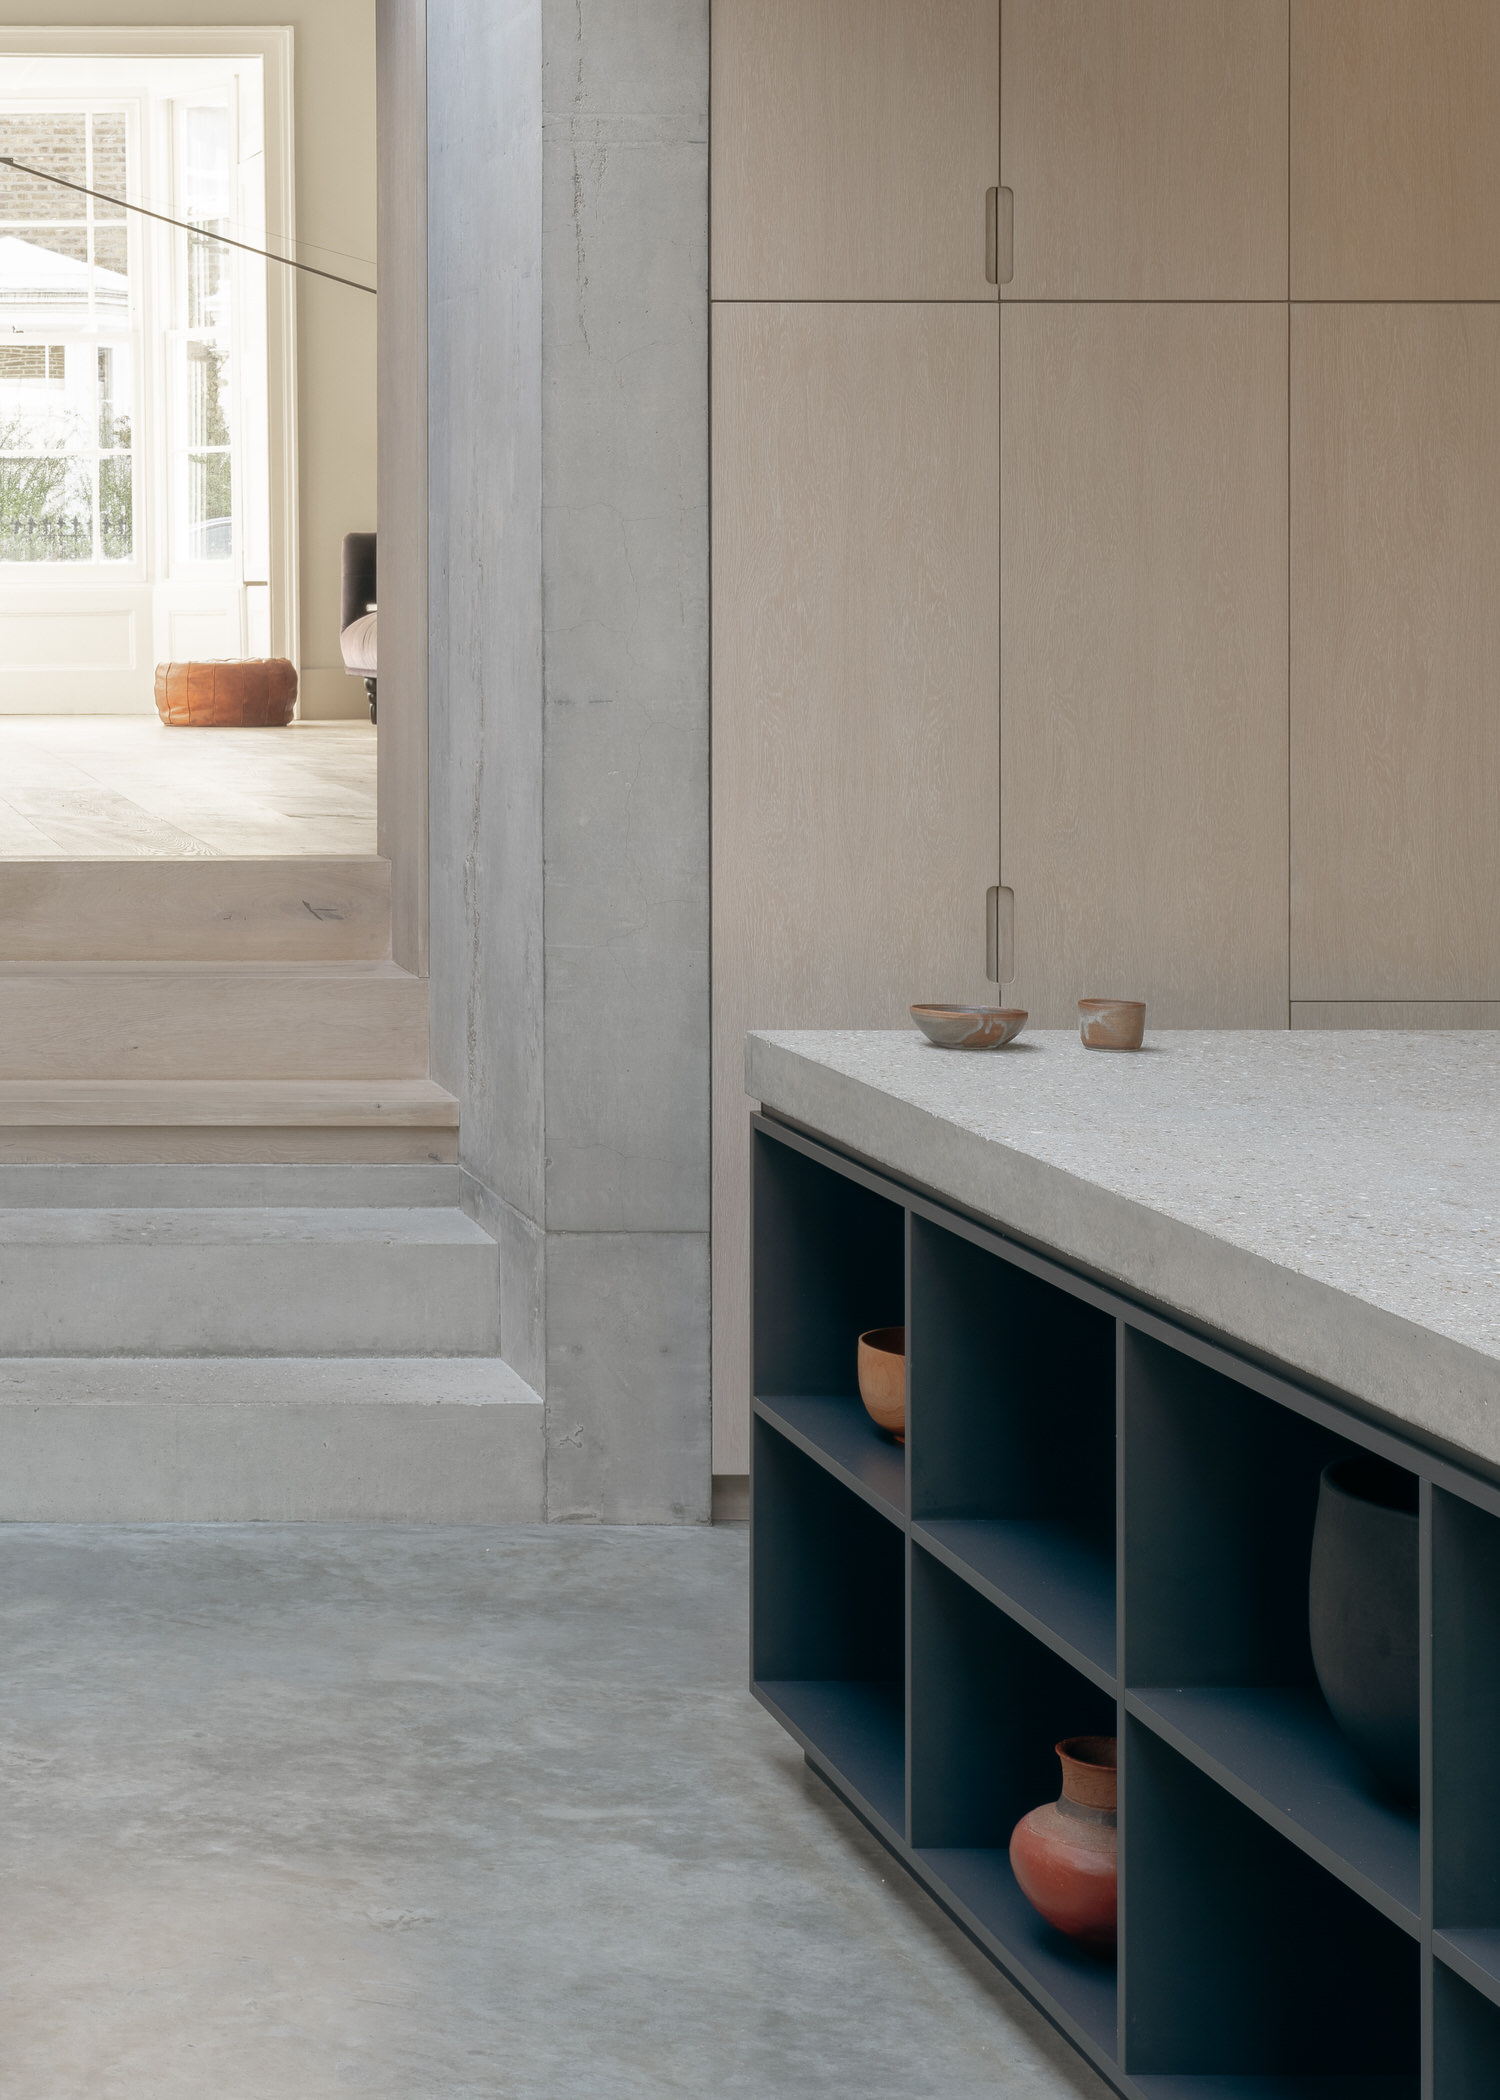 Dgn Studio Concrete Plinth House East London Residential Architecture Photo Nick Dearden Yellowtrace 02